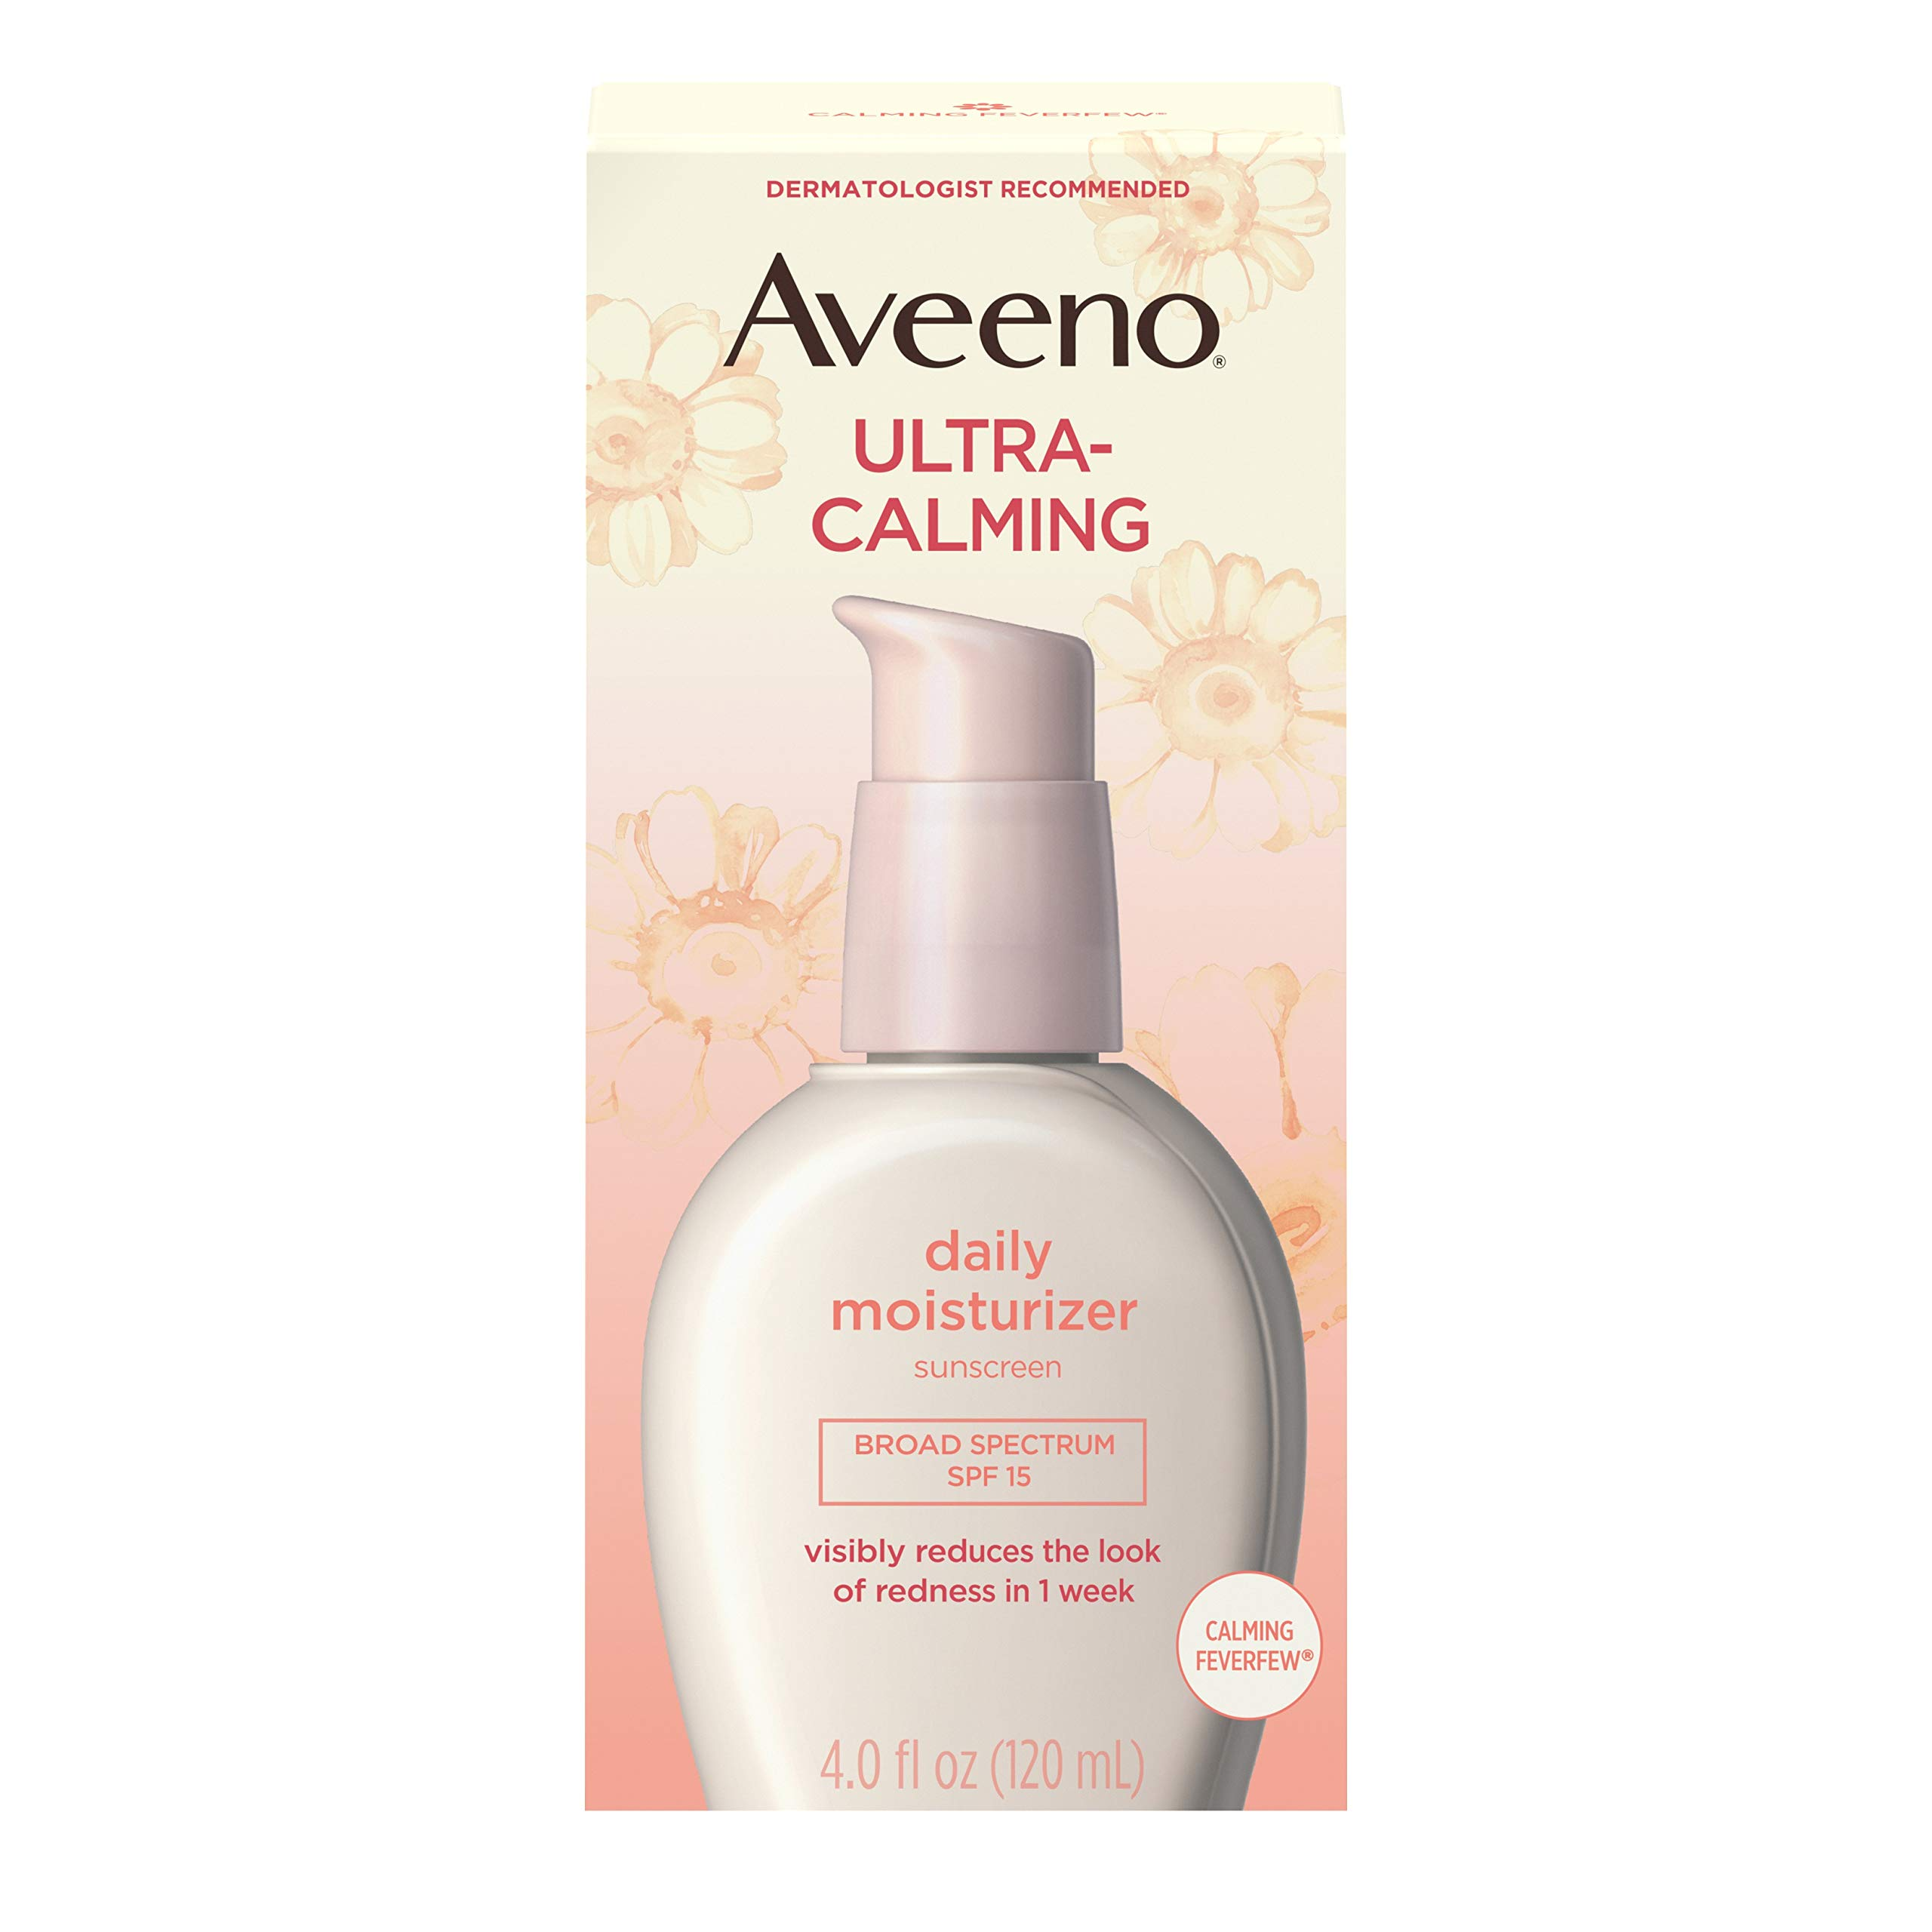 Aveeno Ultra-Calming Fragrance-Free Daily Facial Moisturizer for Sensitive, Dry Skin with SPF 15 Sunscreen, Calming Feverfew & Nourishing Oat, 4 fl. oz